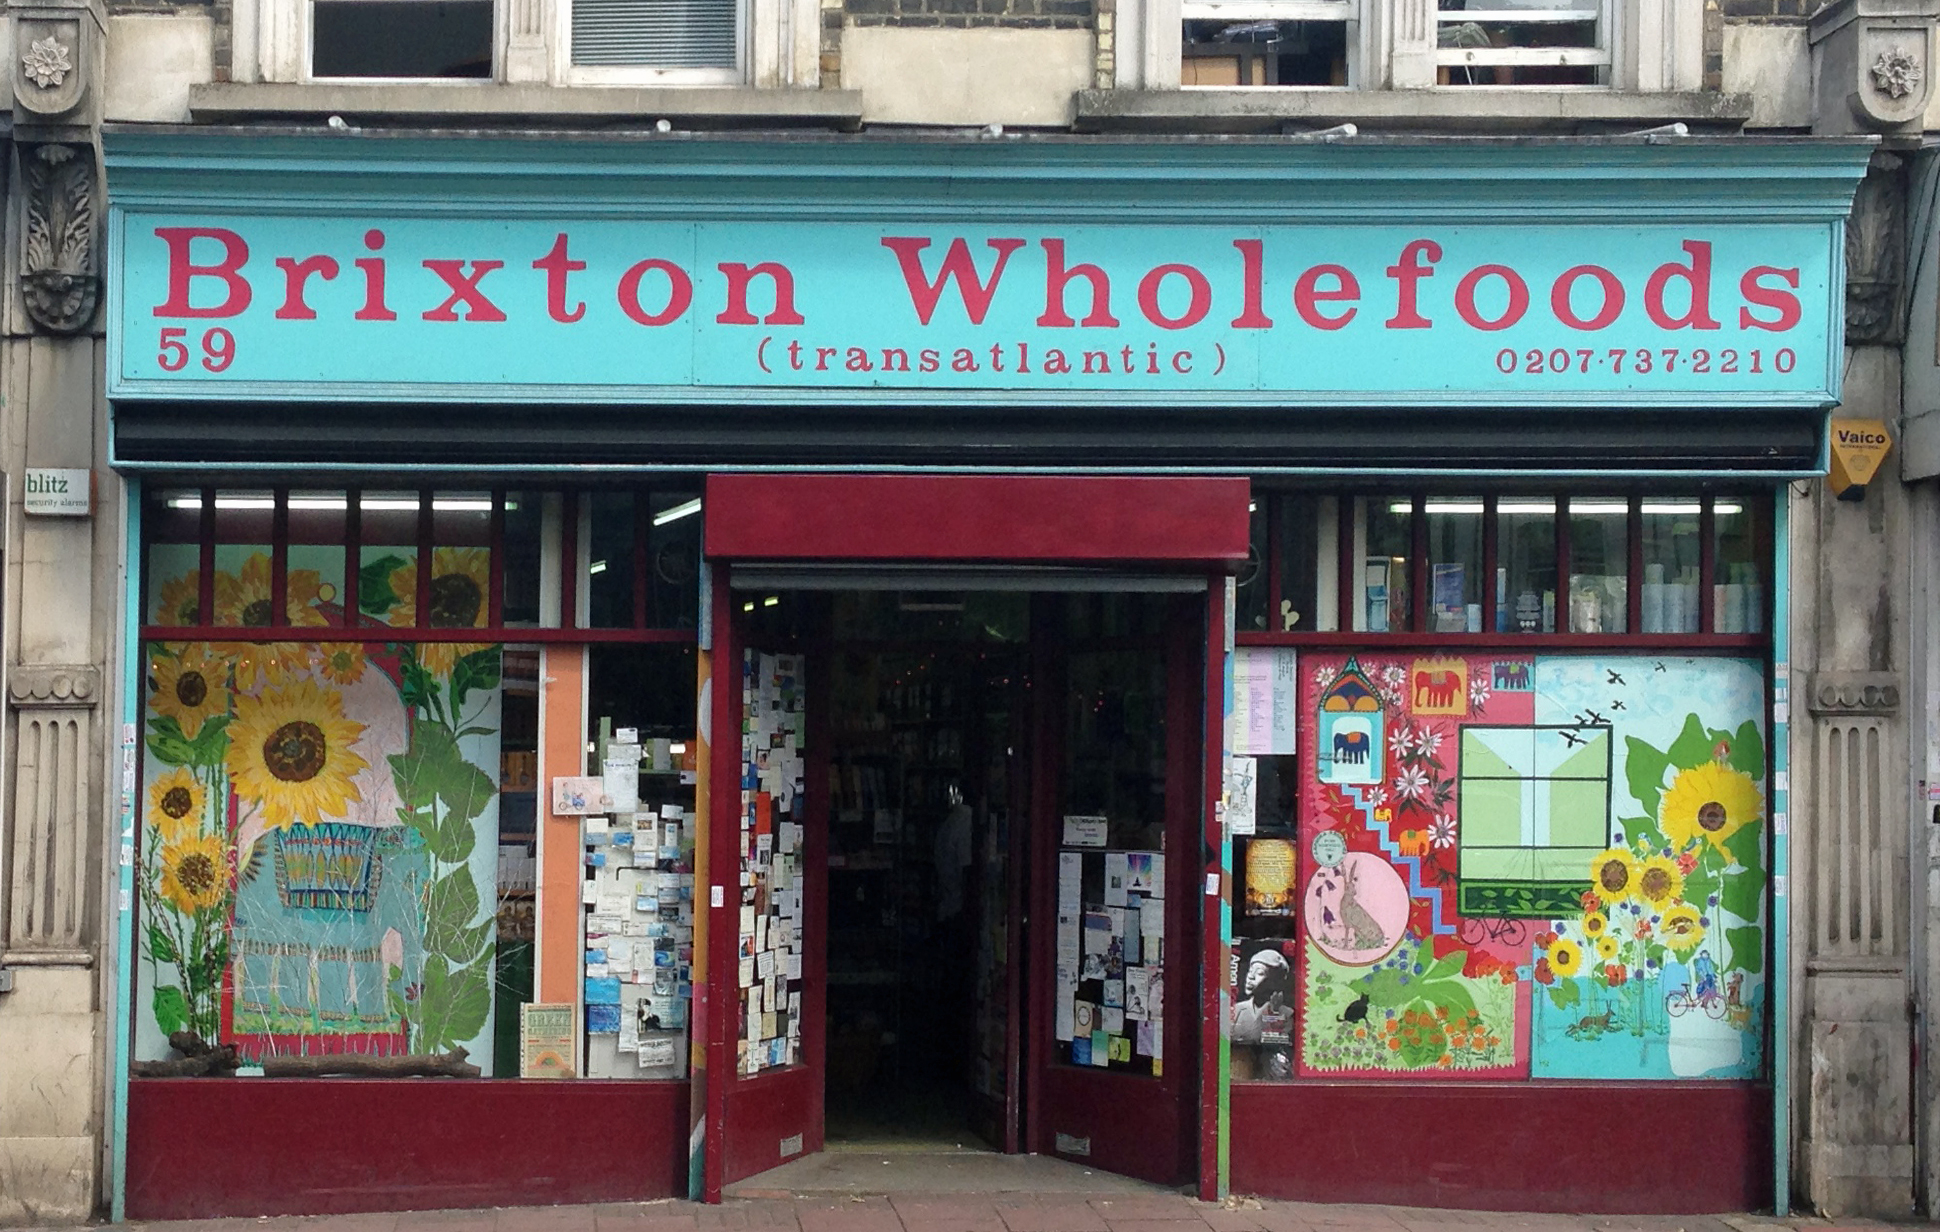 Atlantic Whole Foods Brixton